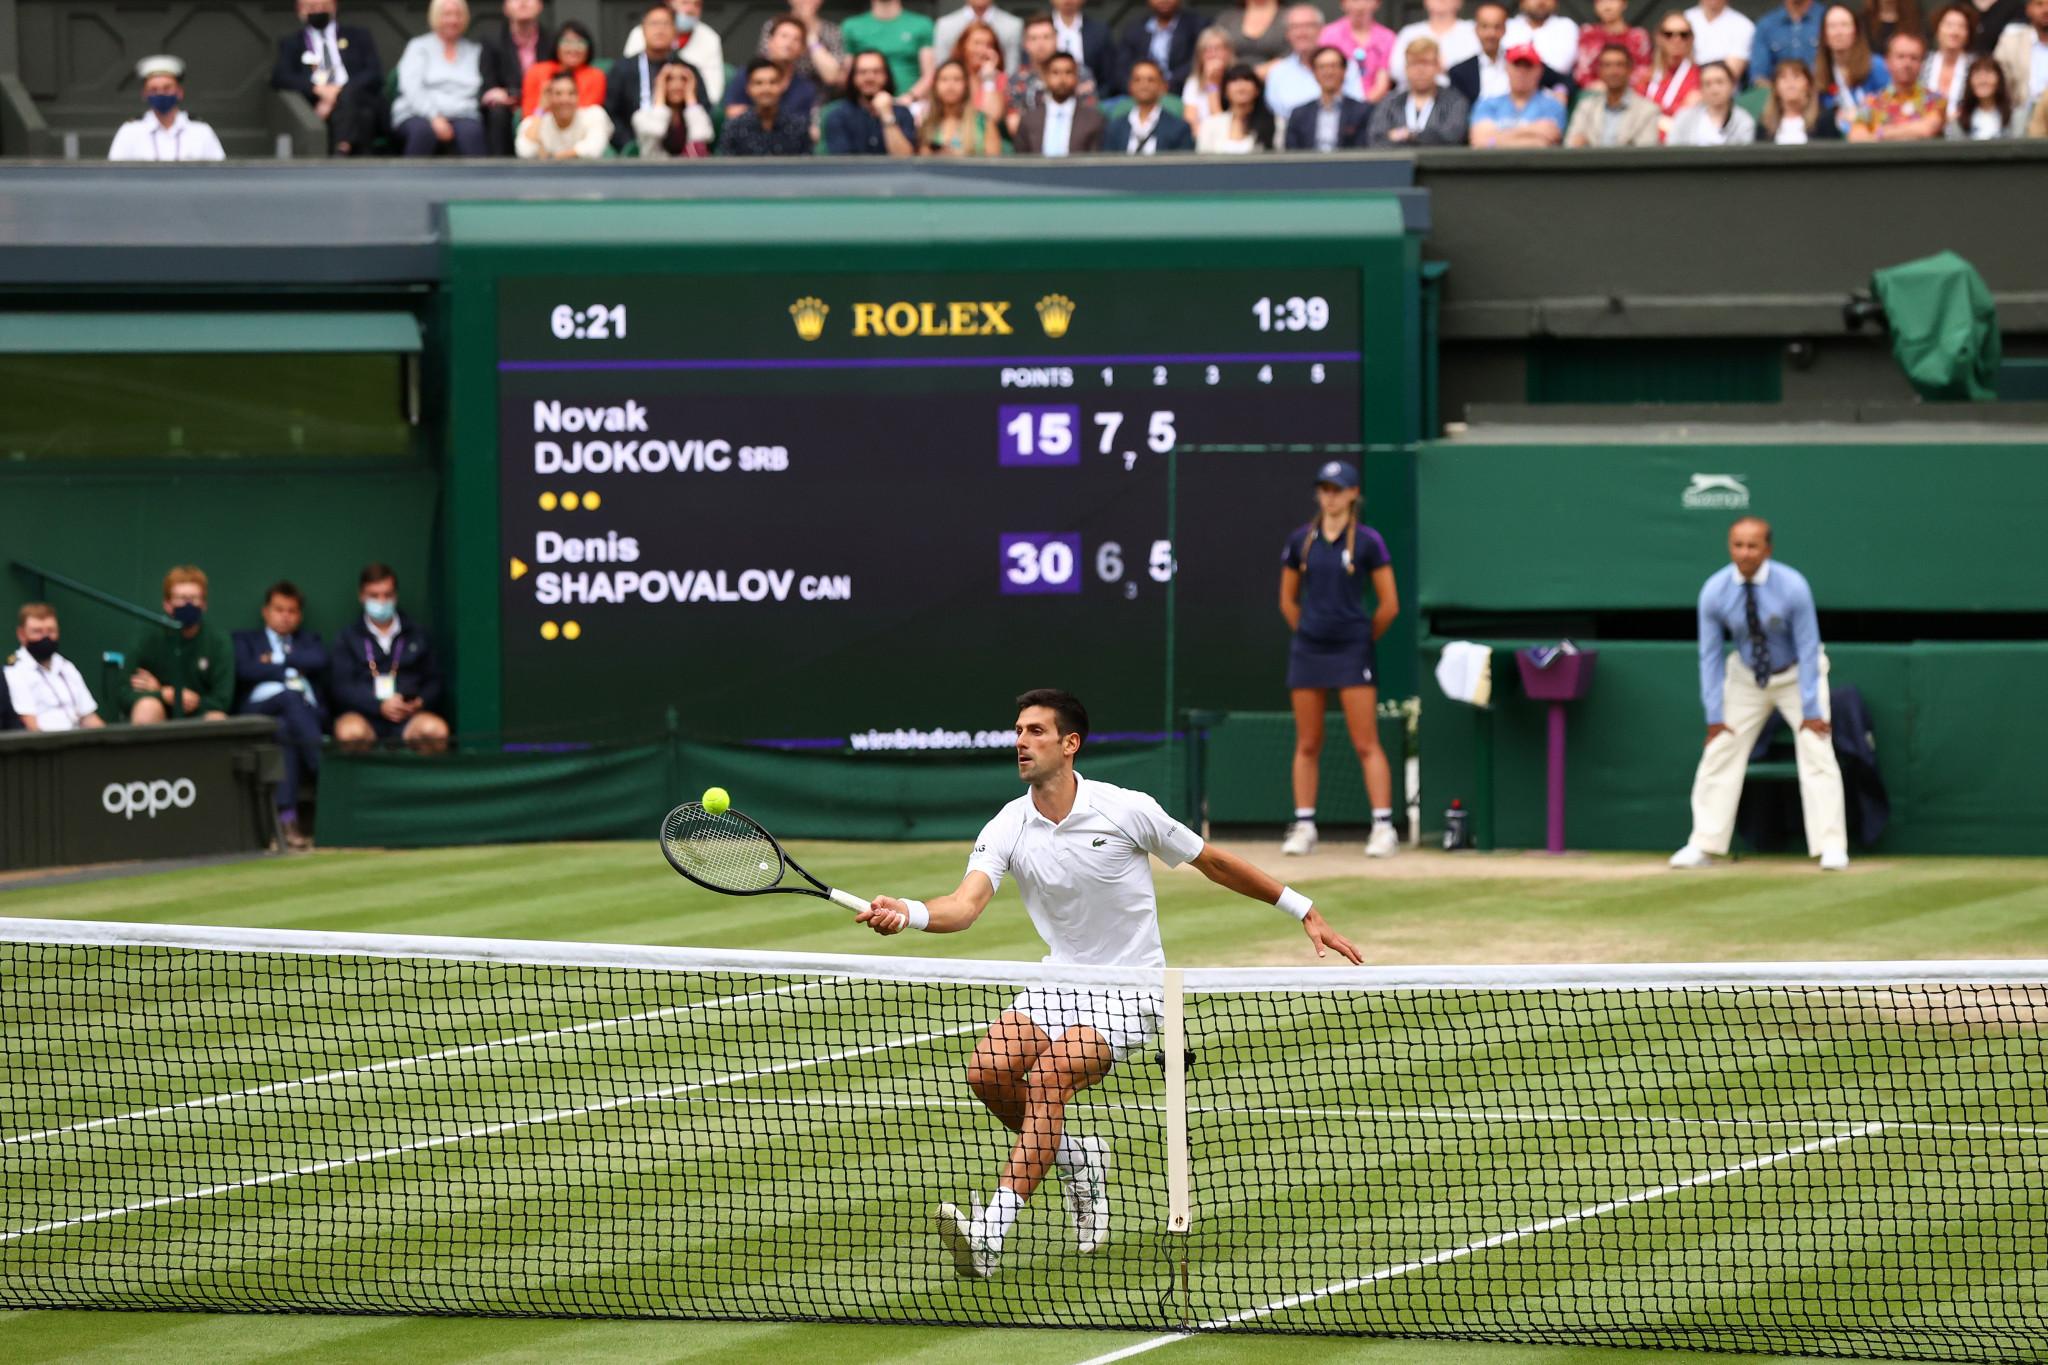 Top seed Djokovic battles through as Berrettini becomes first Italian man to reach Wimbledon men's singles final